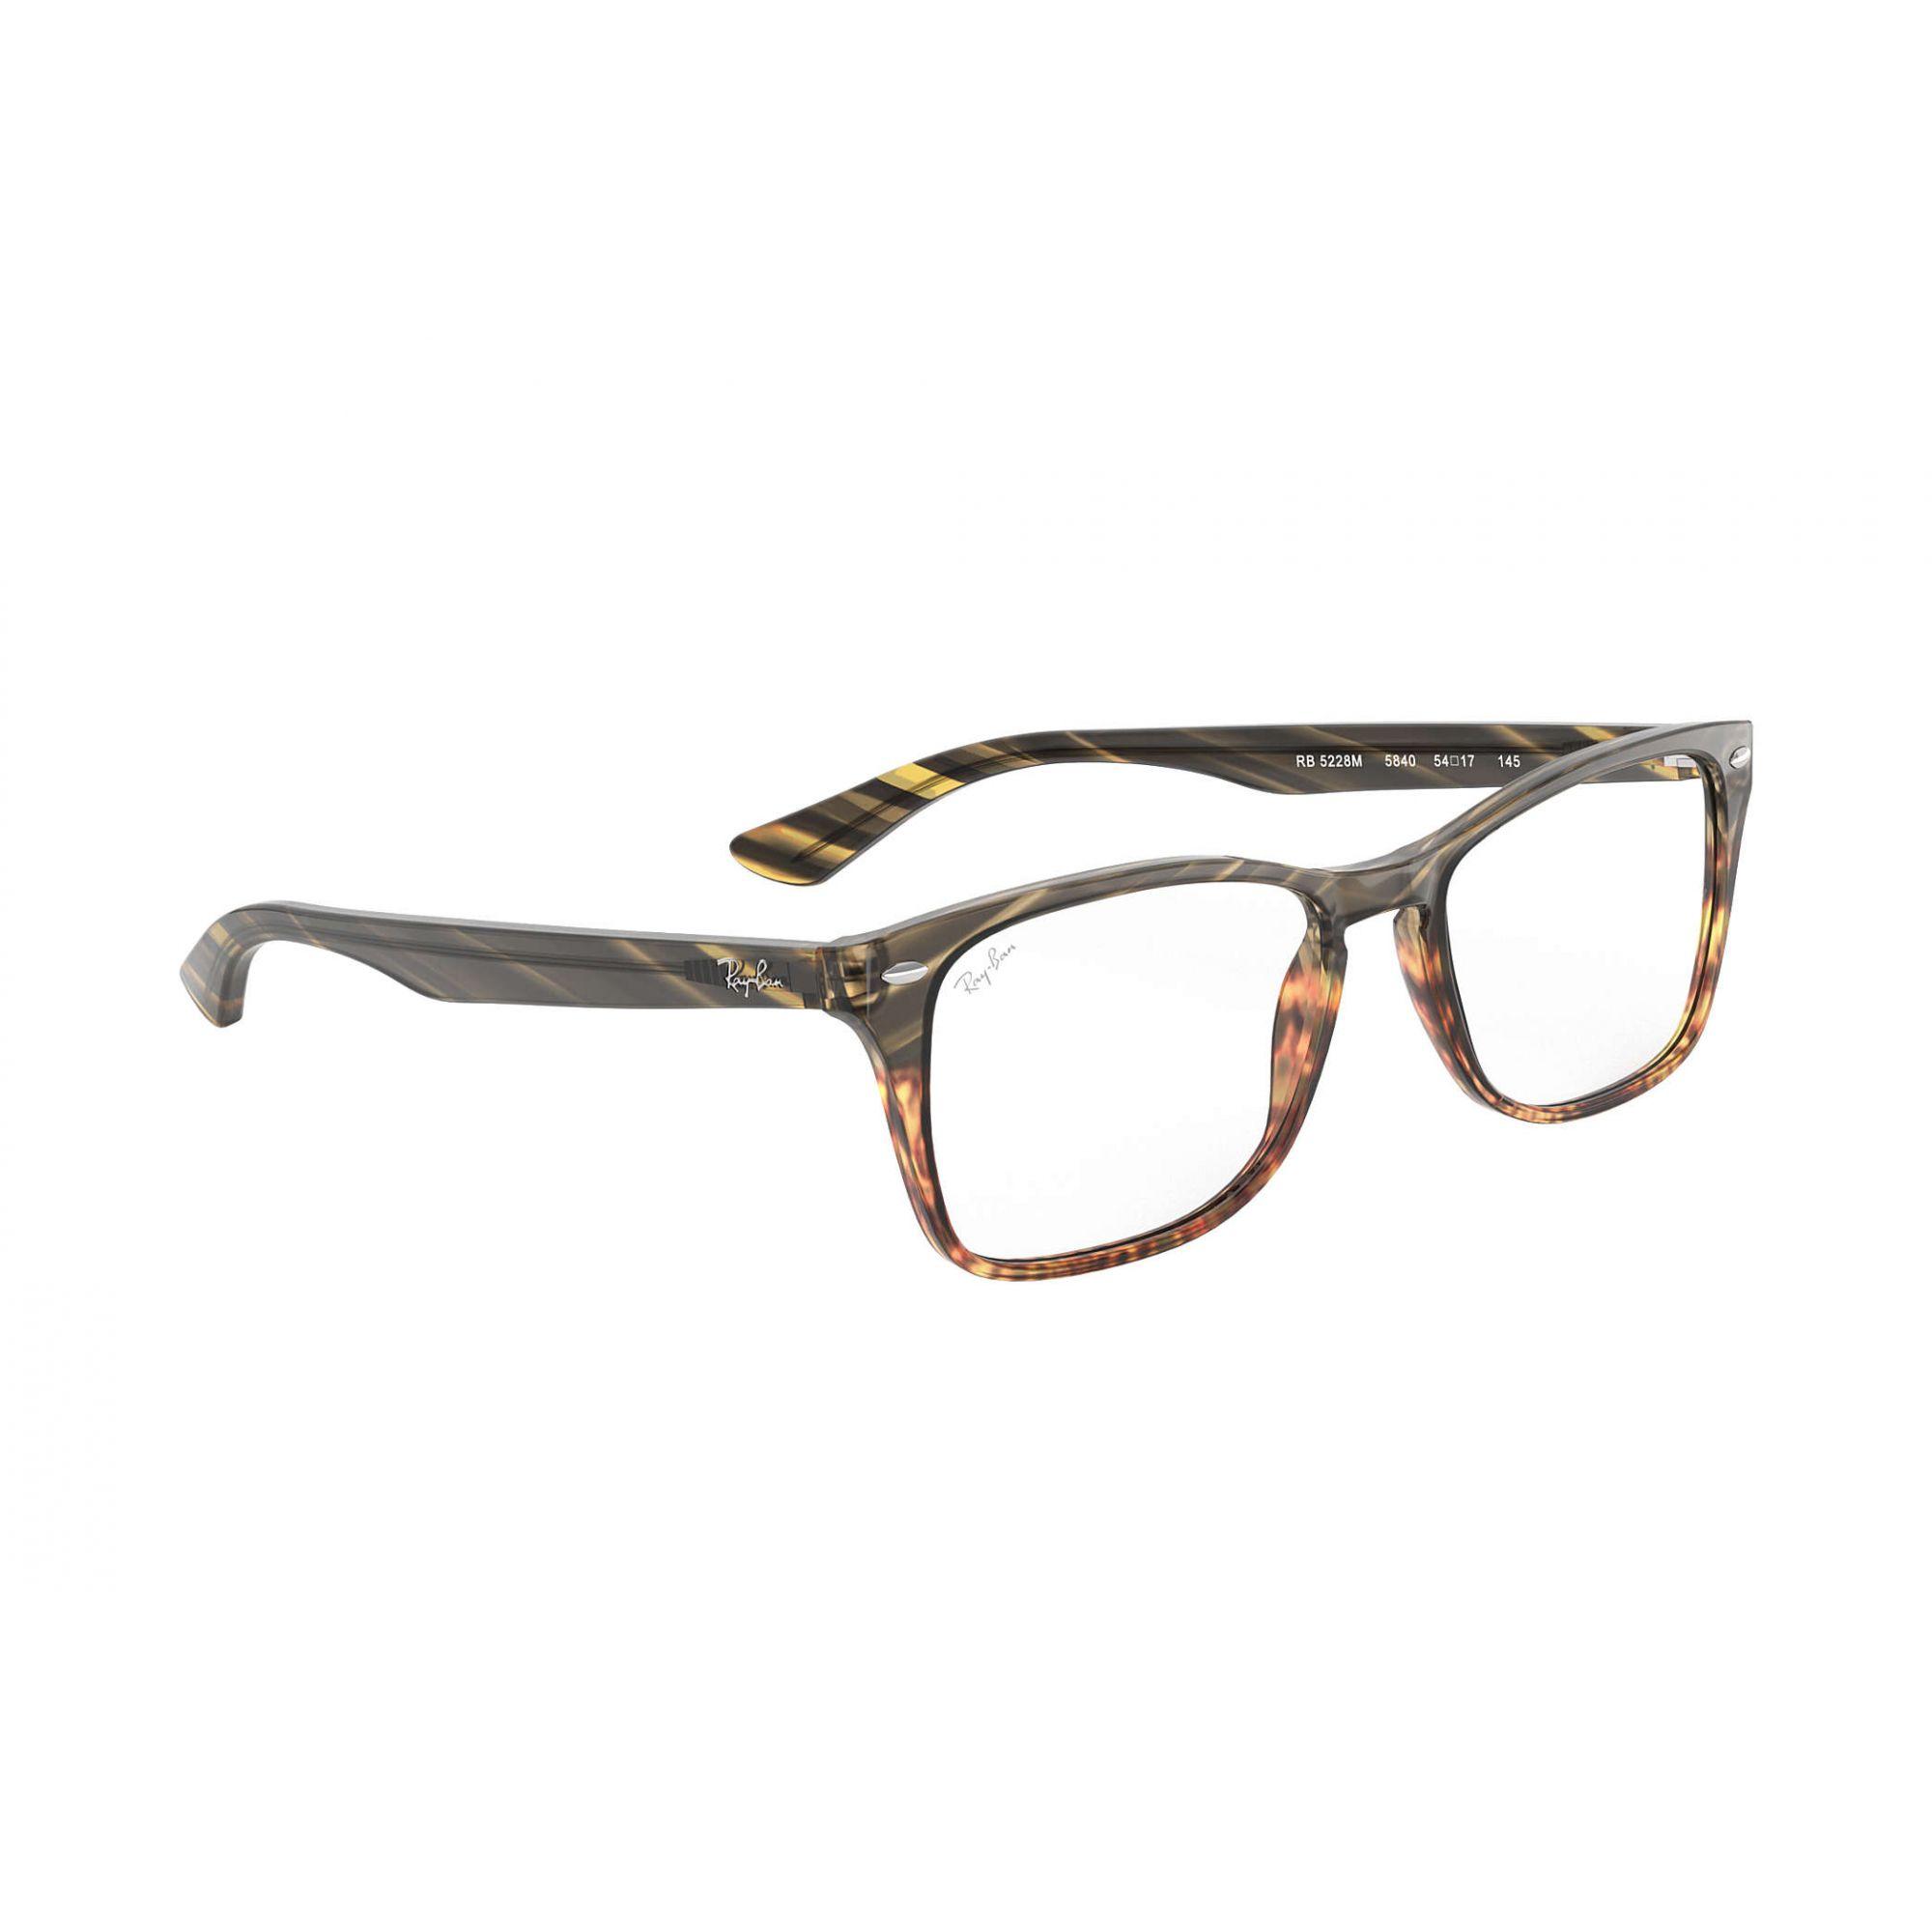 Ray Ban - RB5228M 5840 - Óculos de grau